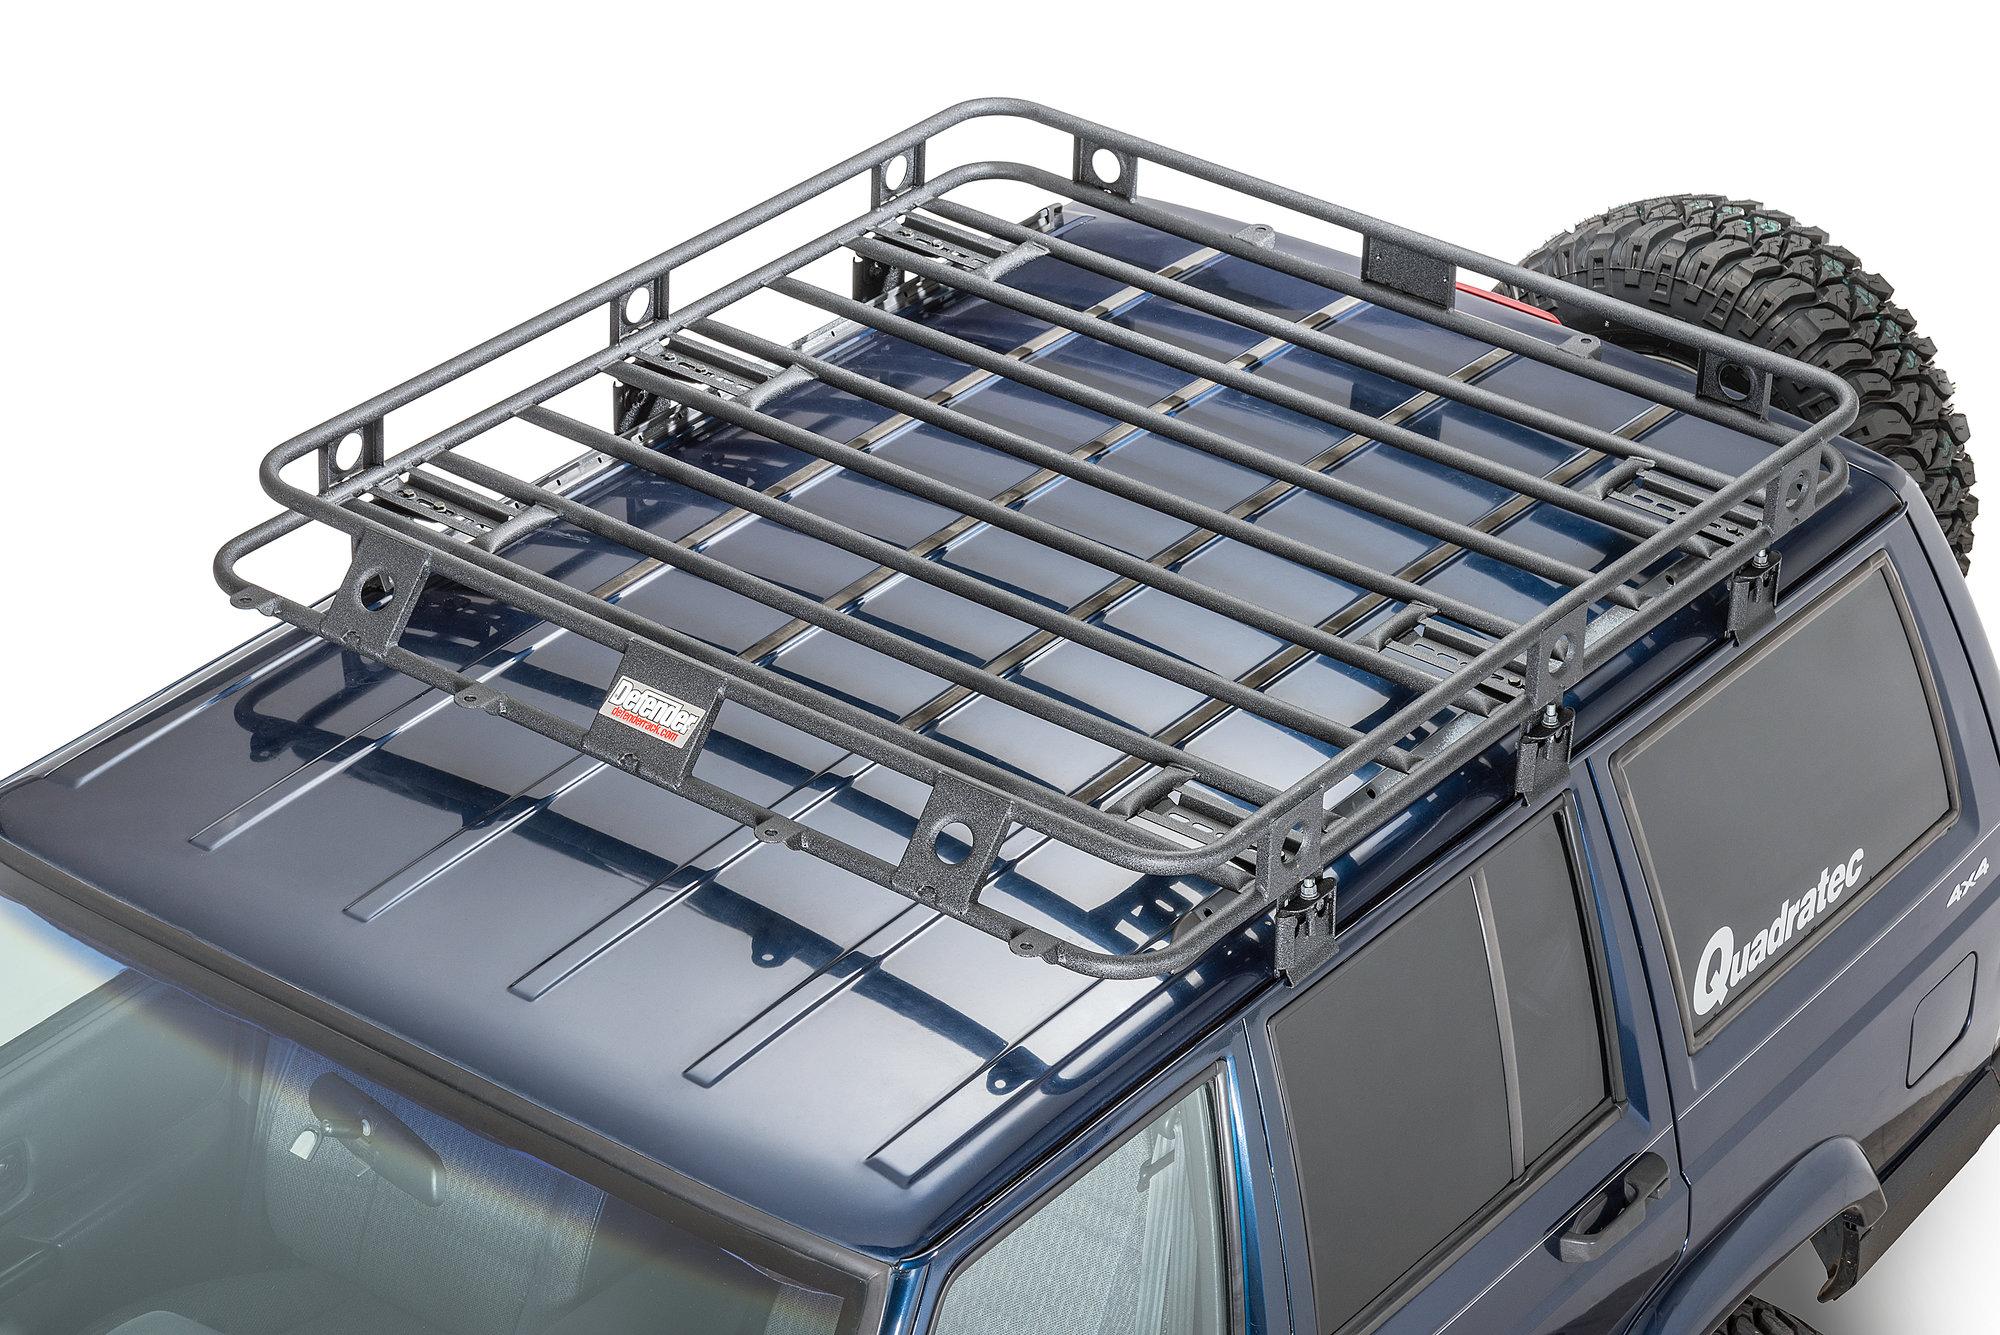 2014 Jeep Grand Cherokee Guage